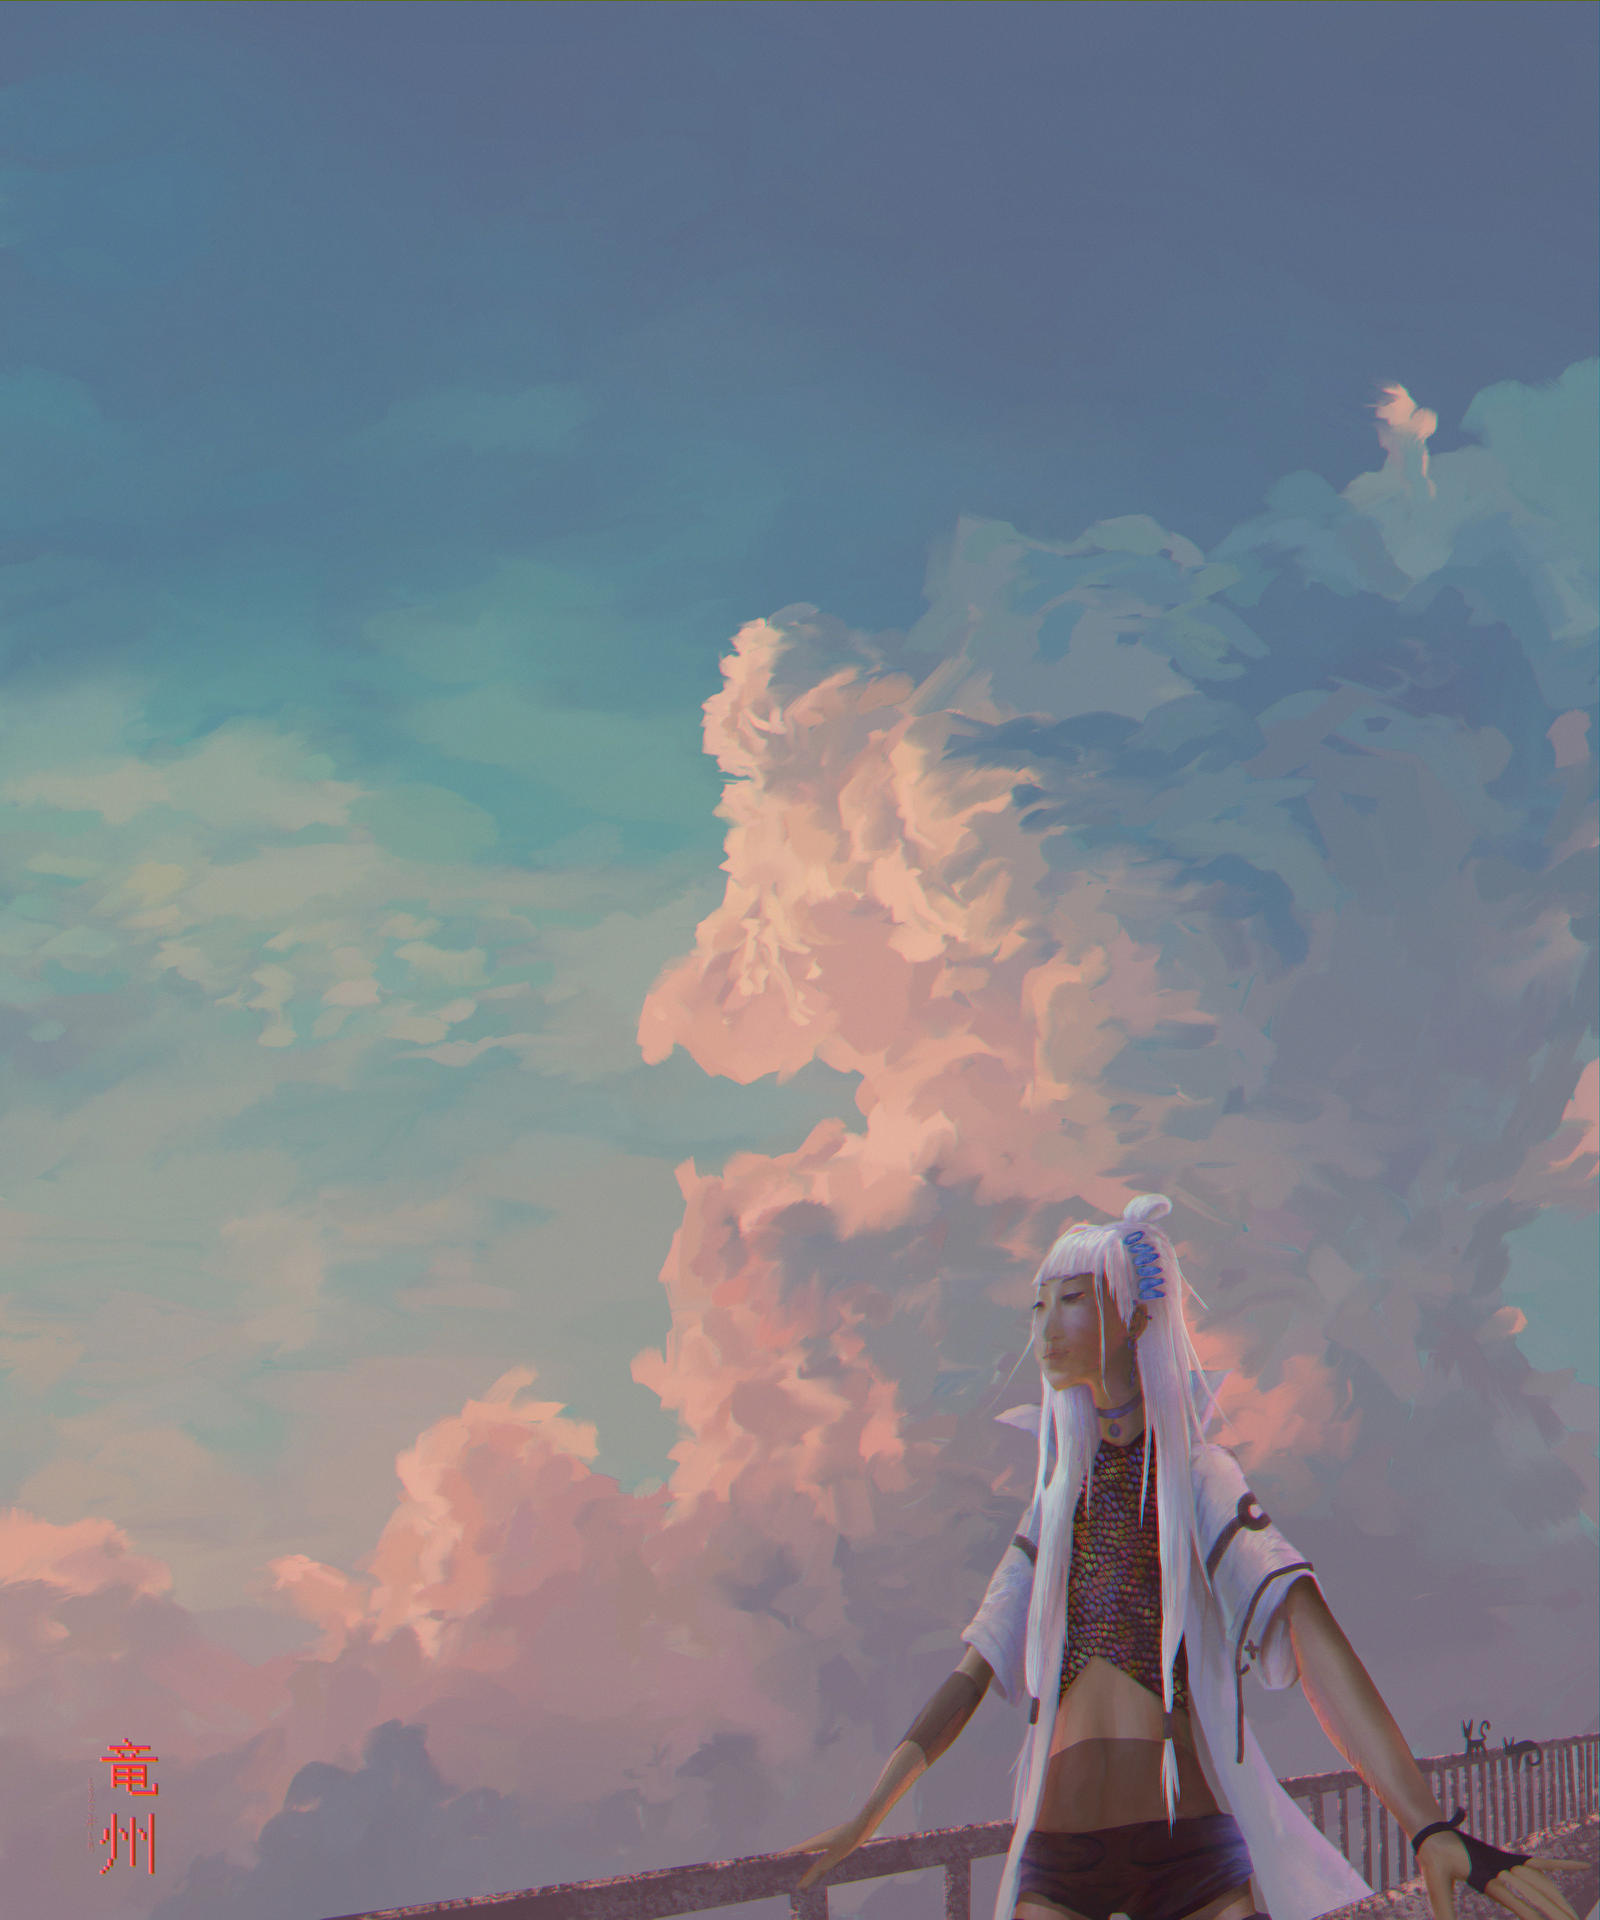 Numb Daydream